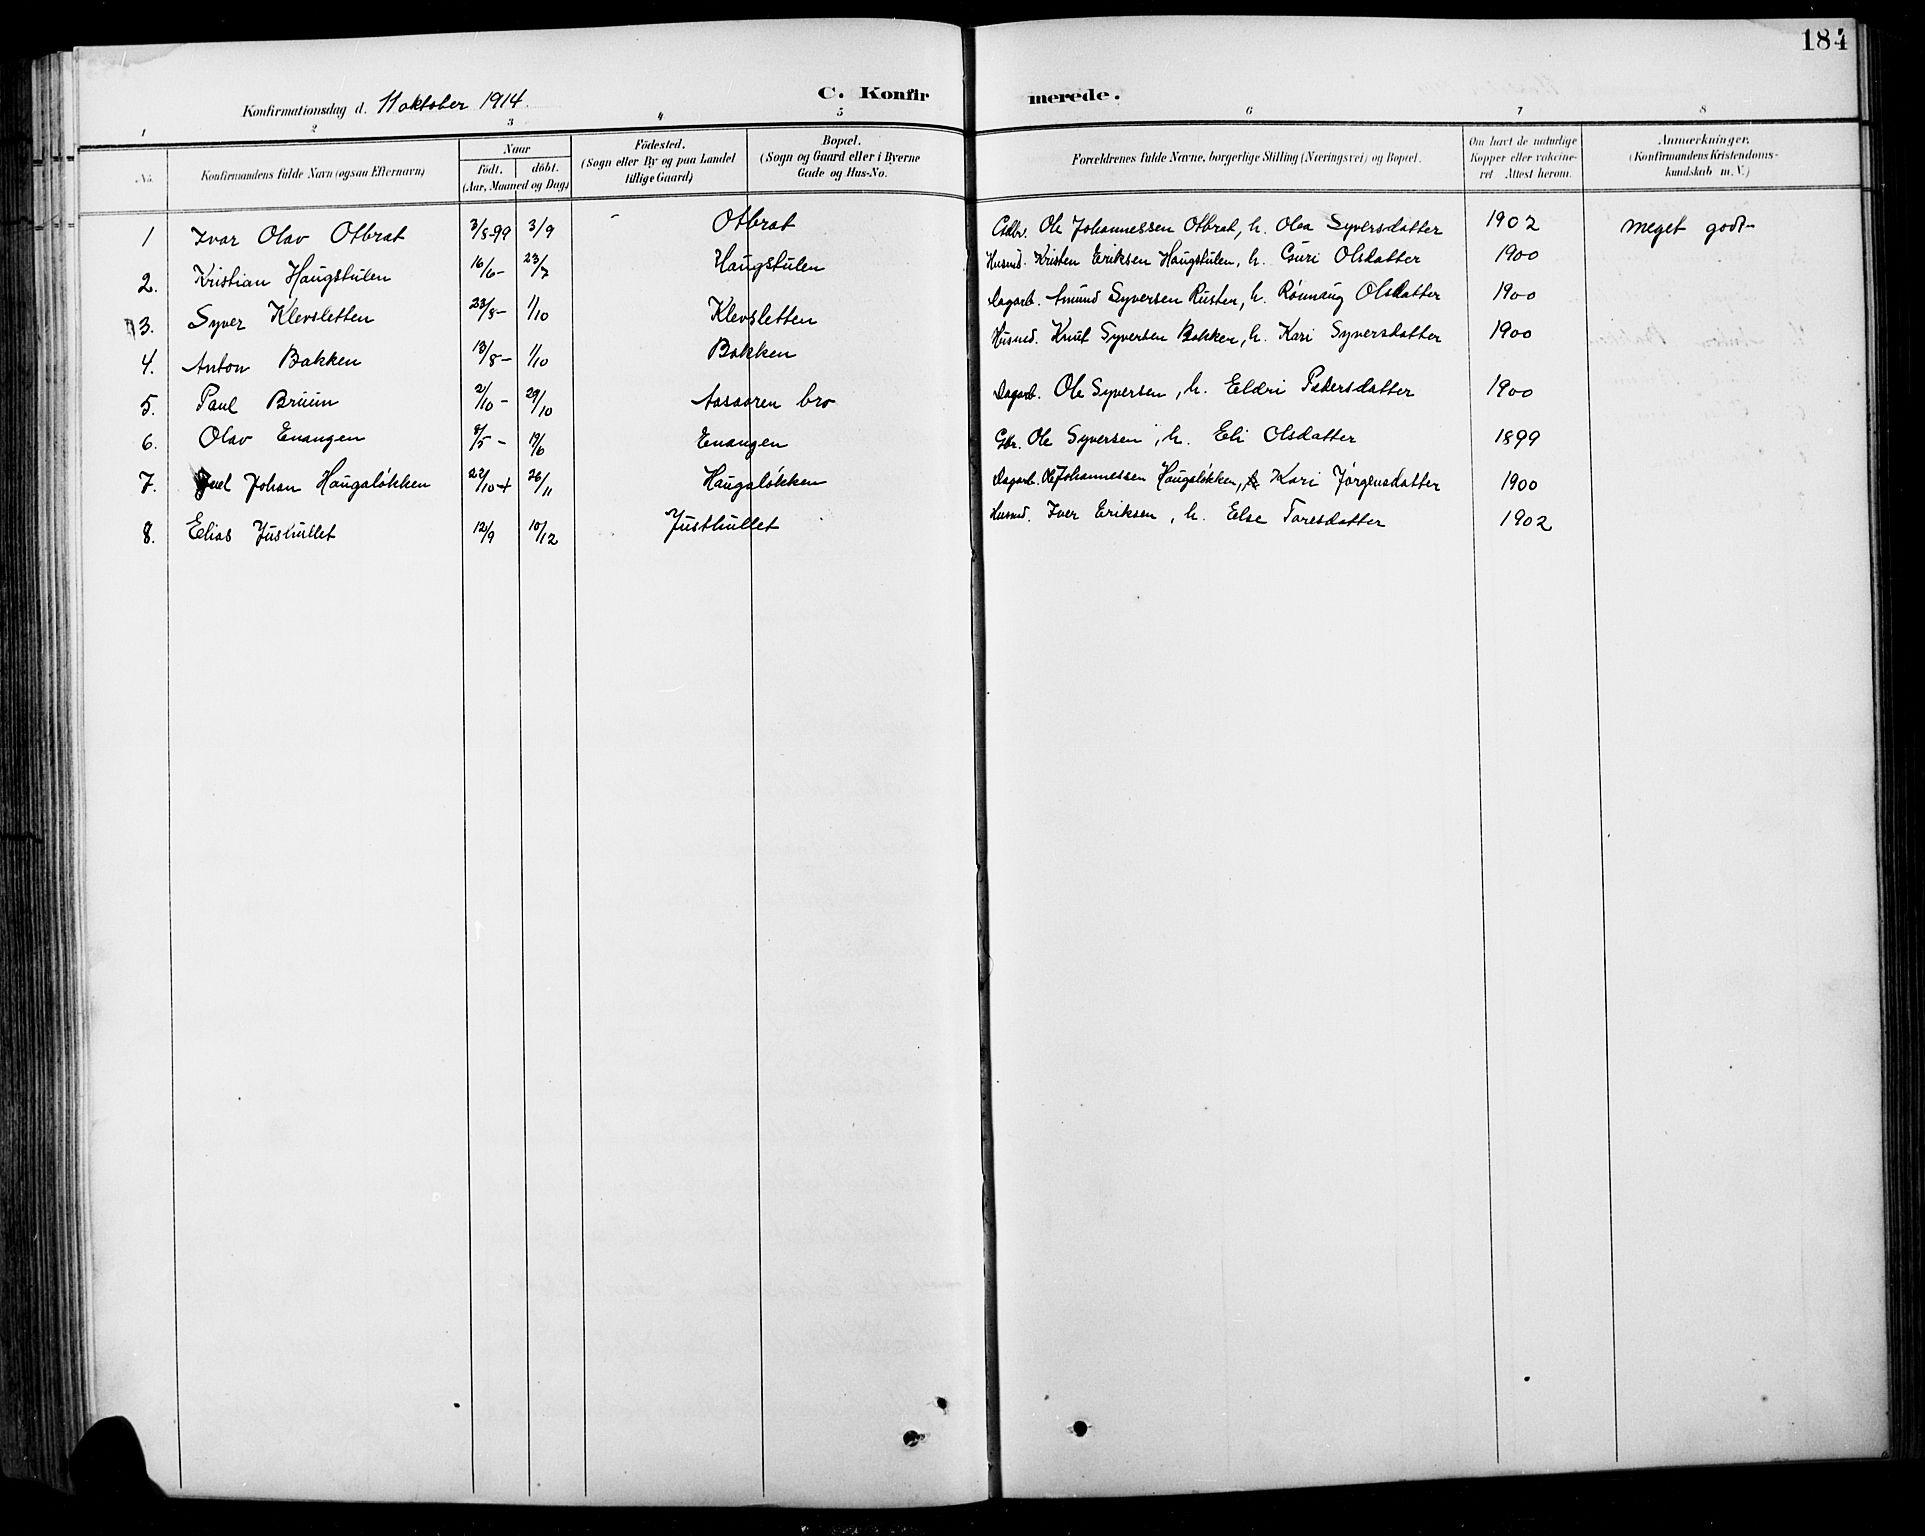 SAH, Sel prestekontor, Klokkerbok nr. 1, 1894-1923, s. 184